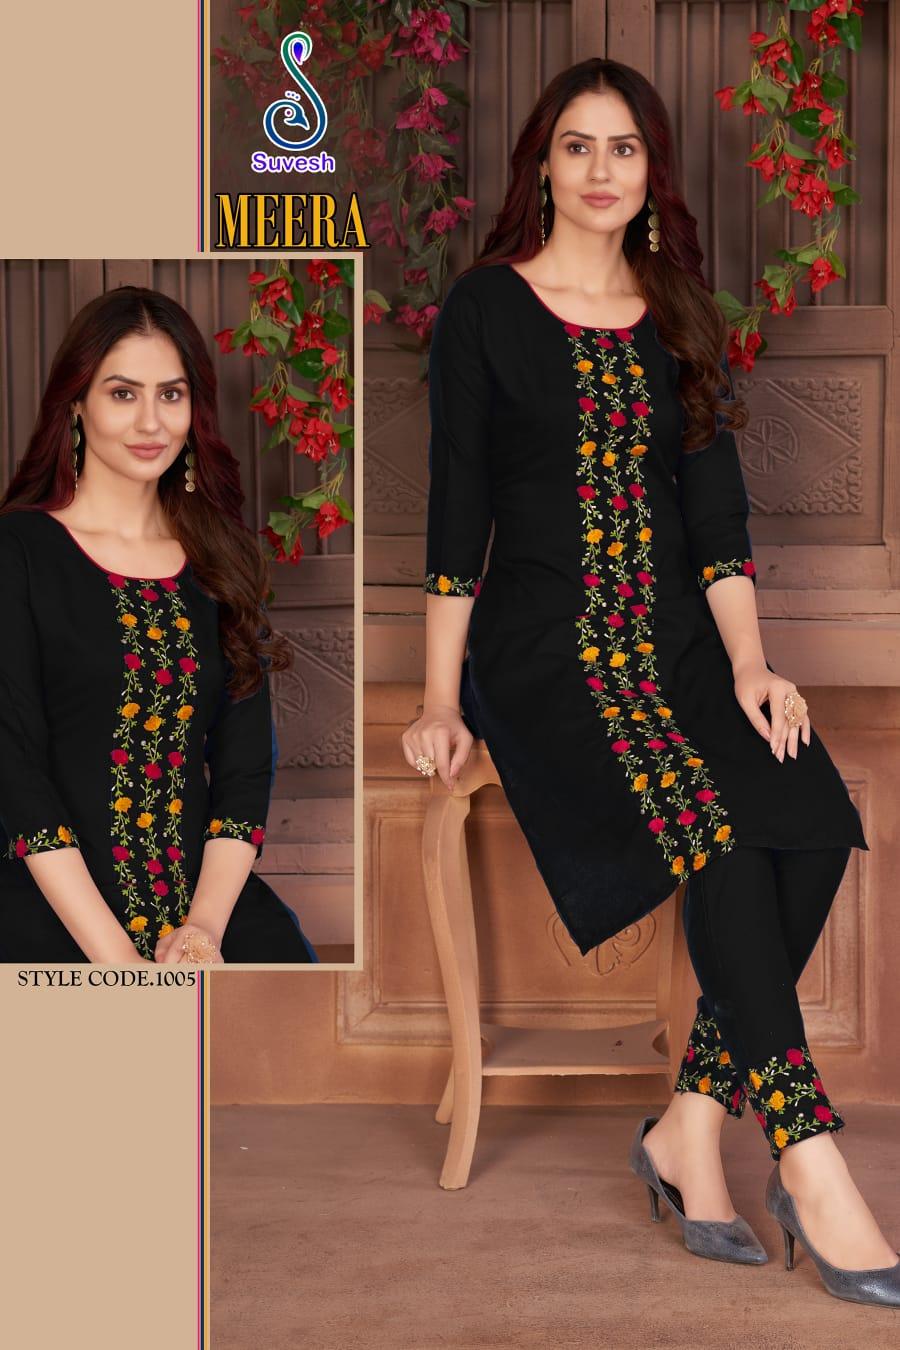 Suvesh Meera Kurtis Pant Set Catalog Lowest Price